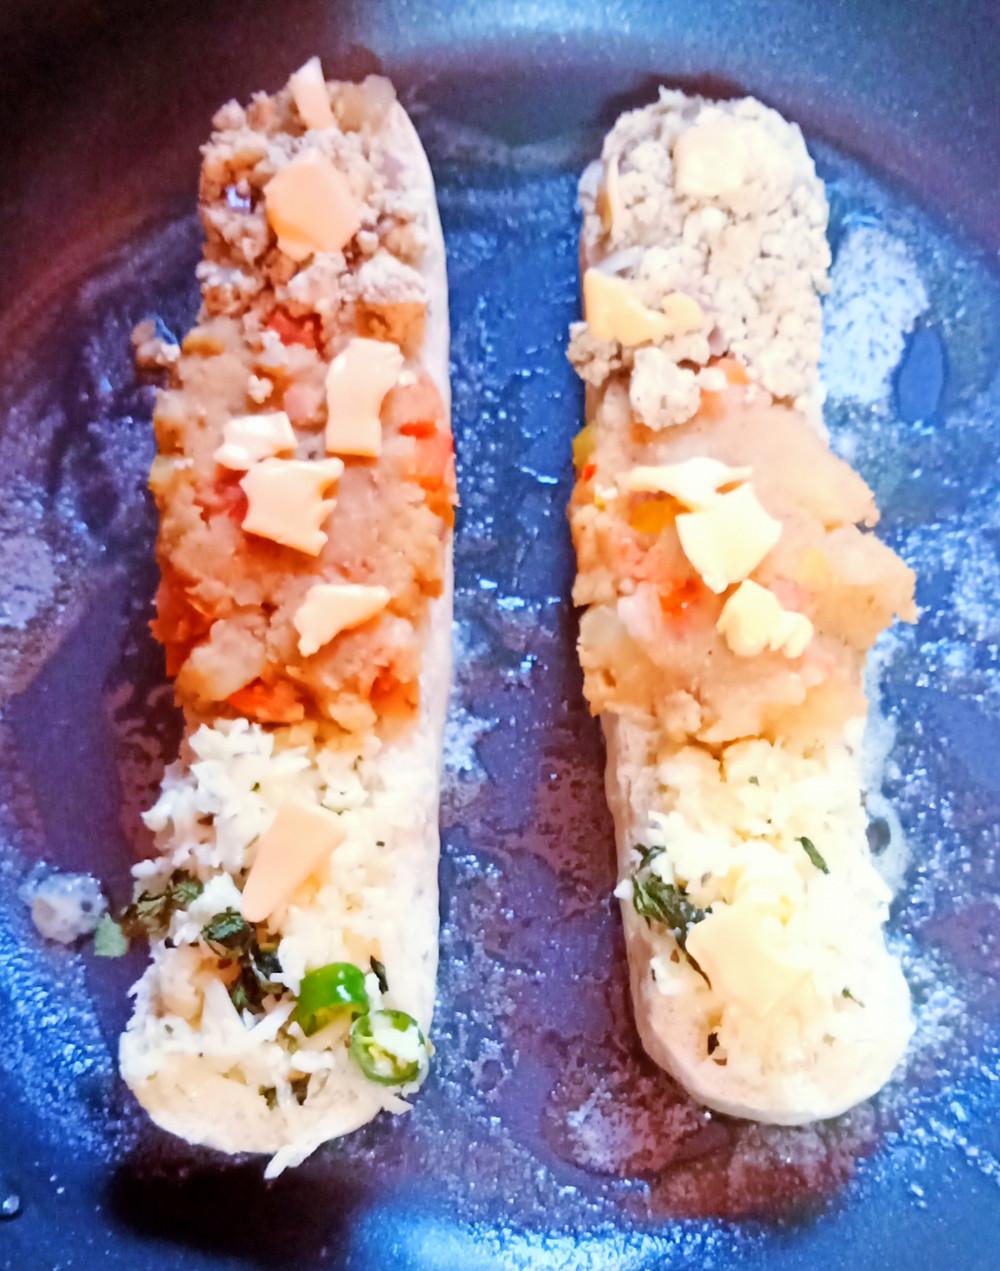 Toasted Hotdog | Chatpata Hotdog | Spicy Hotdog |  Veg Combination Hotdog | by Sandipta's Cookery